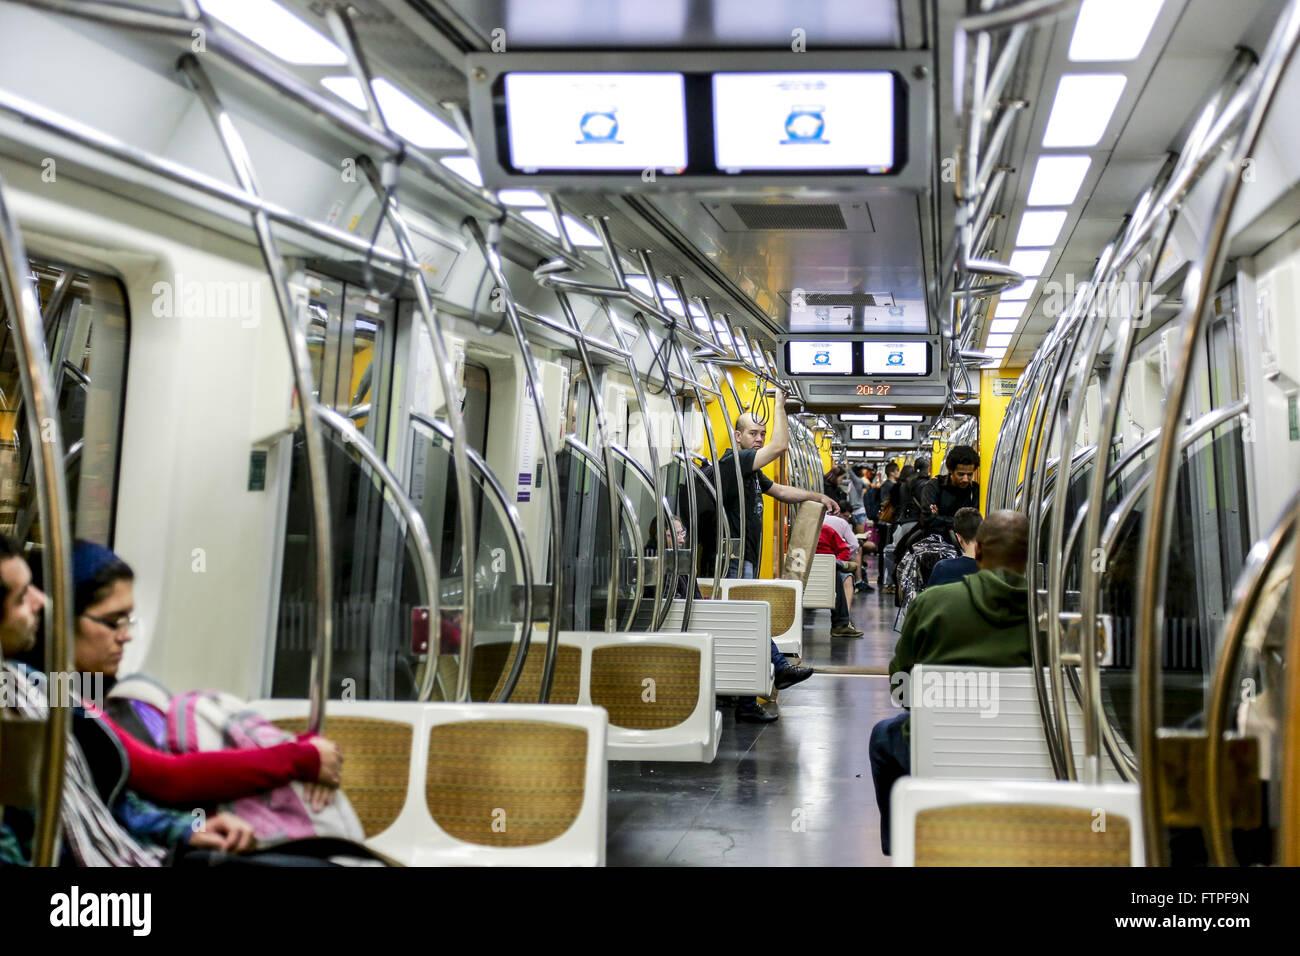 Passengers inside the subway car Yellow Line - Stock Image